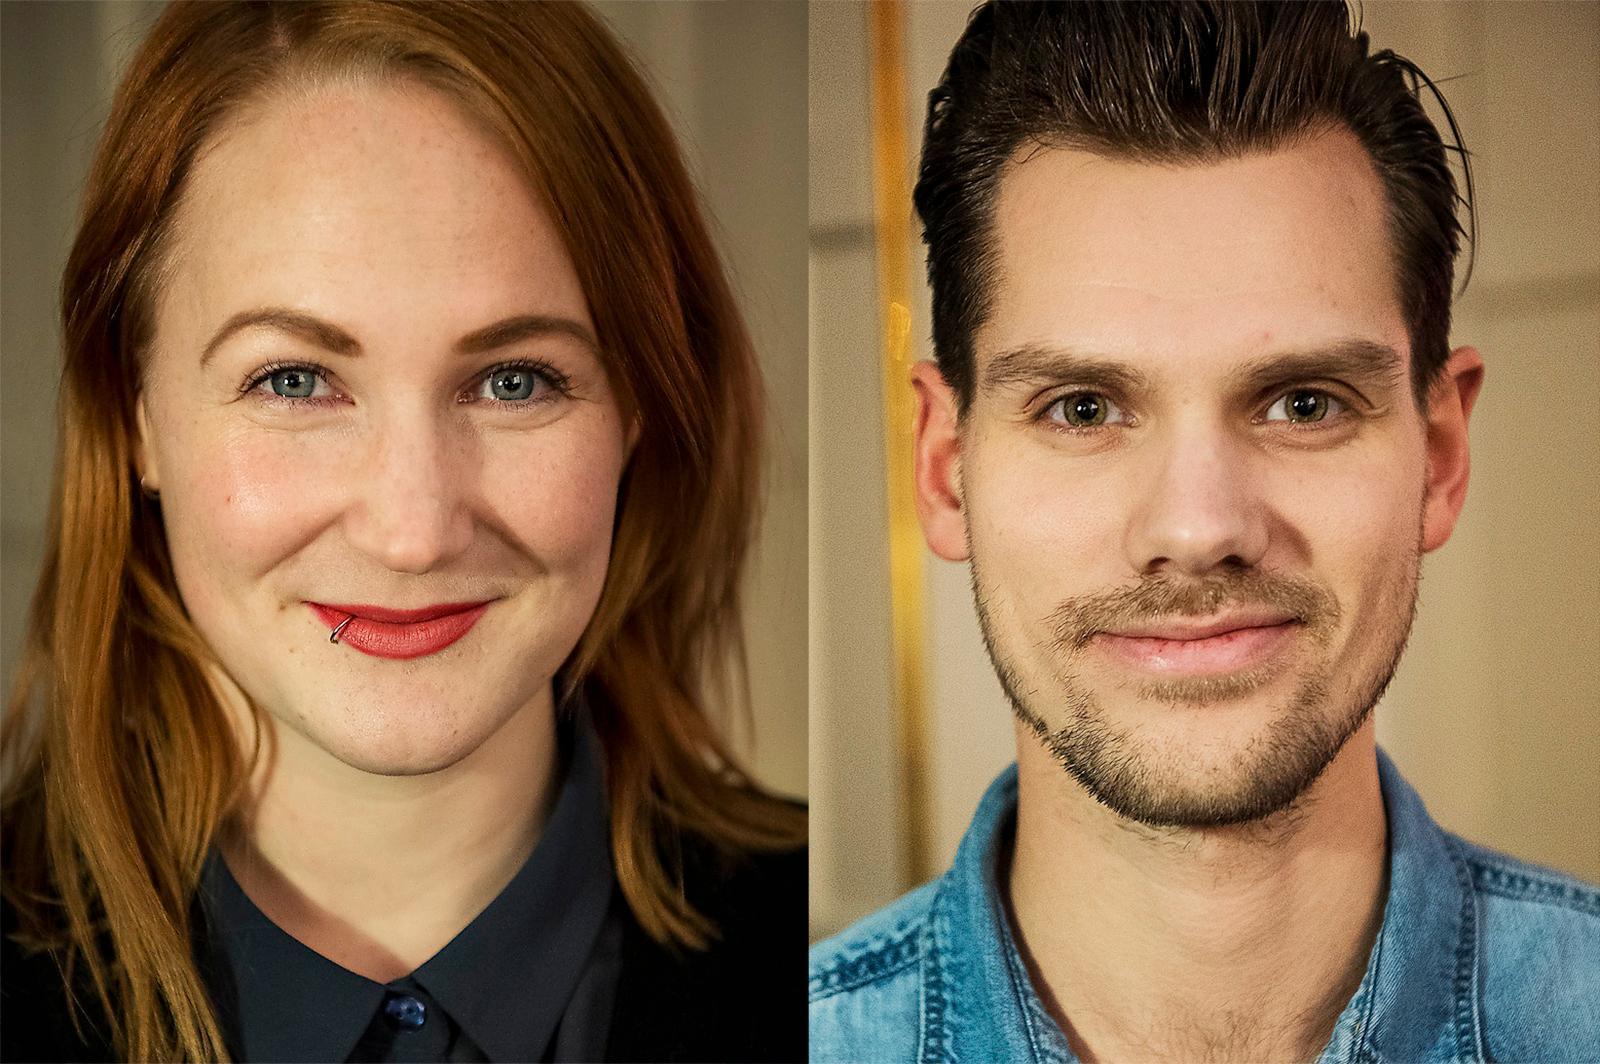 TOVE & PARTRIK Aftonbladets dejtingtestare Tove Björnlund, 28, och Patrik Järgården, 30.